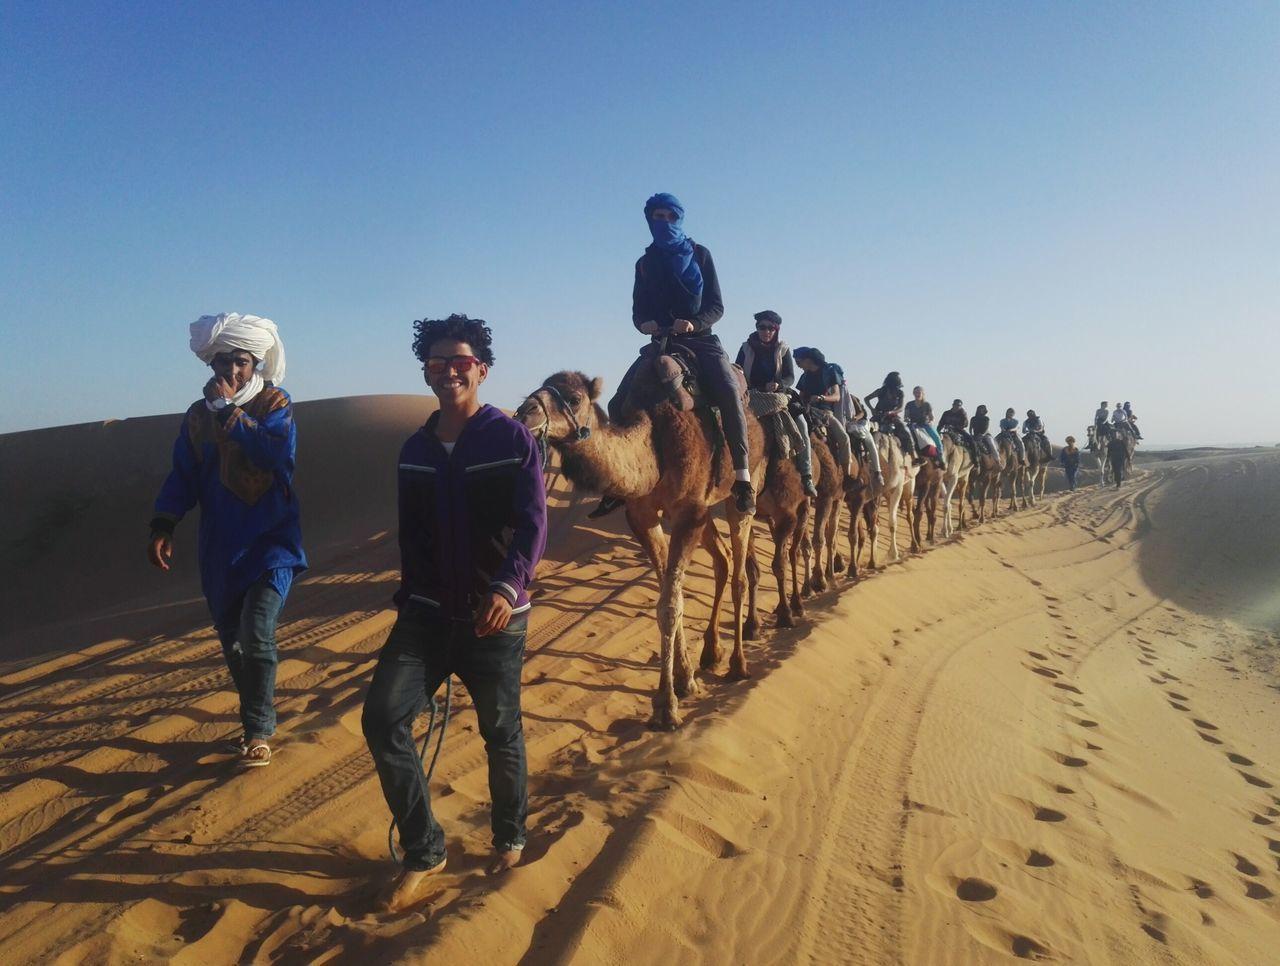 Perspective Hijab Outdoors Desert Desertlife Camel Sahara Desert Sahara Adventure Happiness Looking At Camera Marrocco Walking Sand